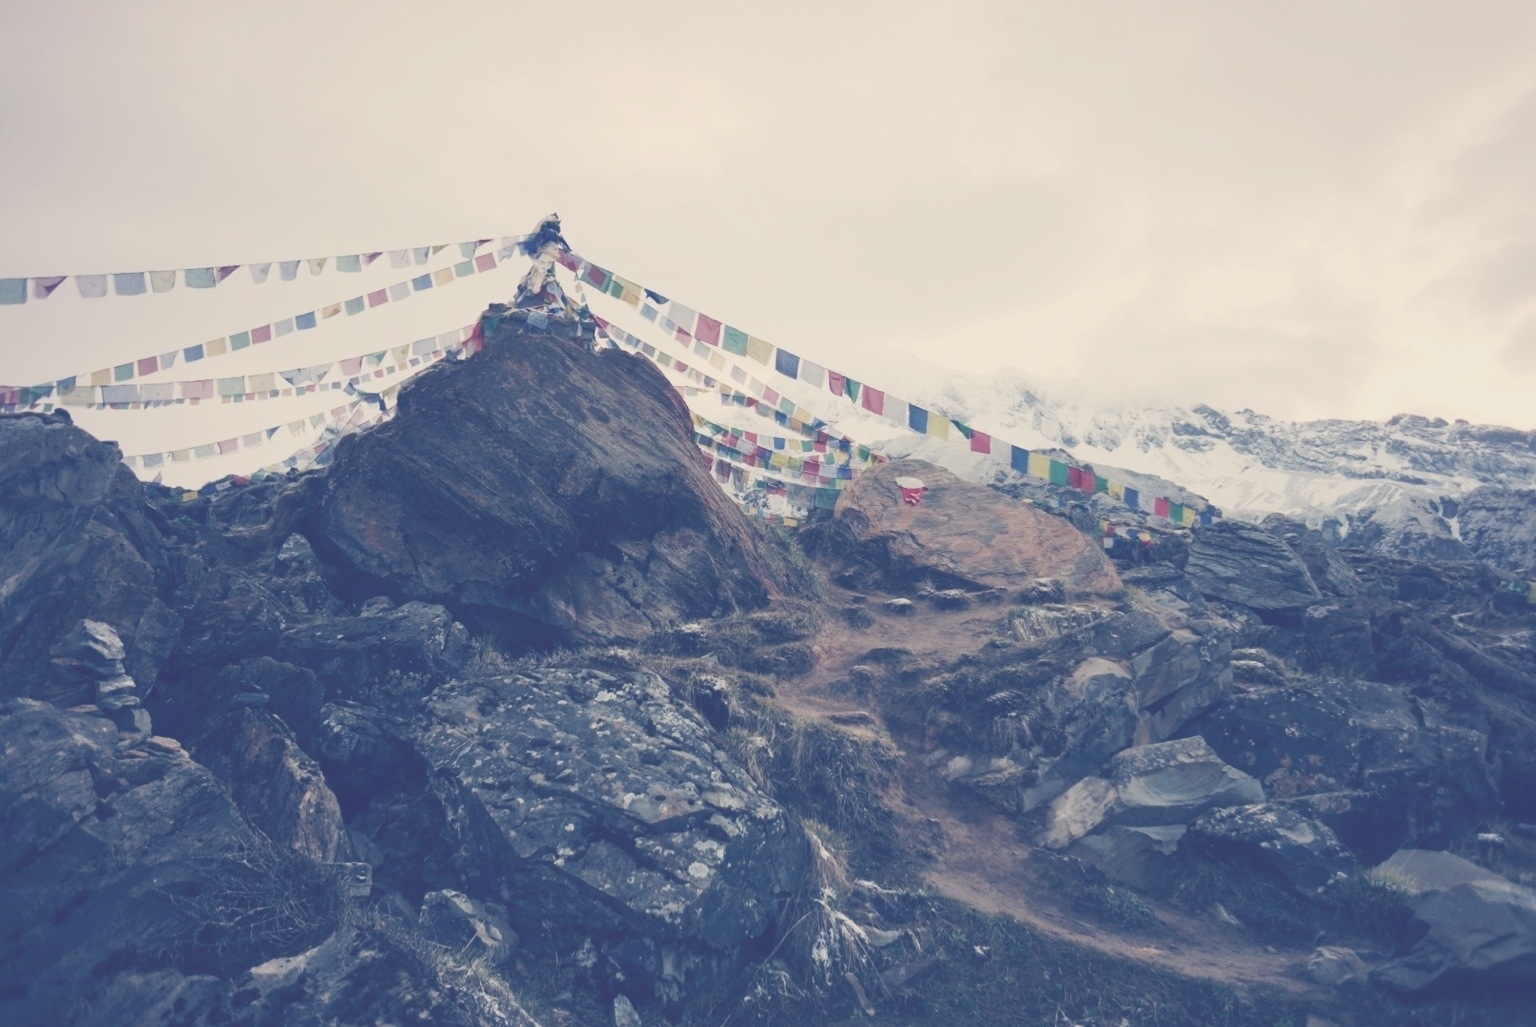 Annapurna Base Camp stupa